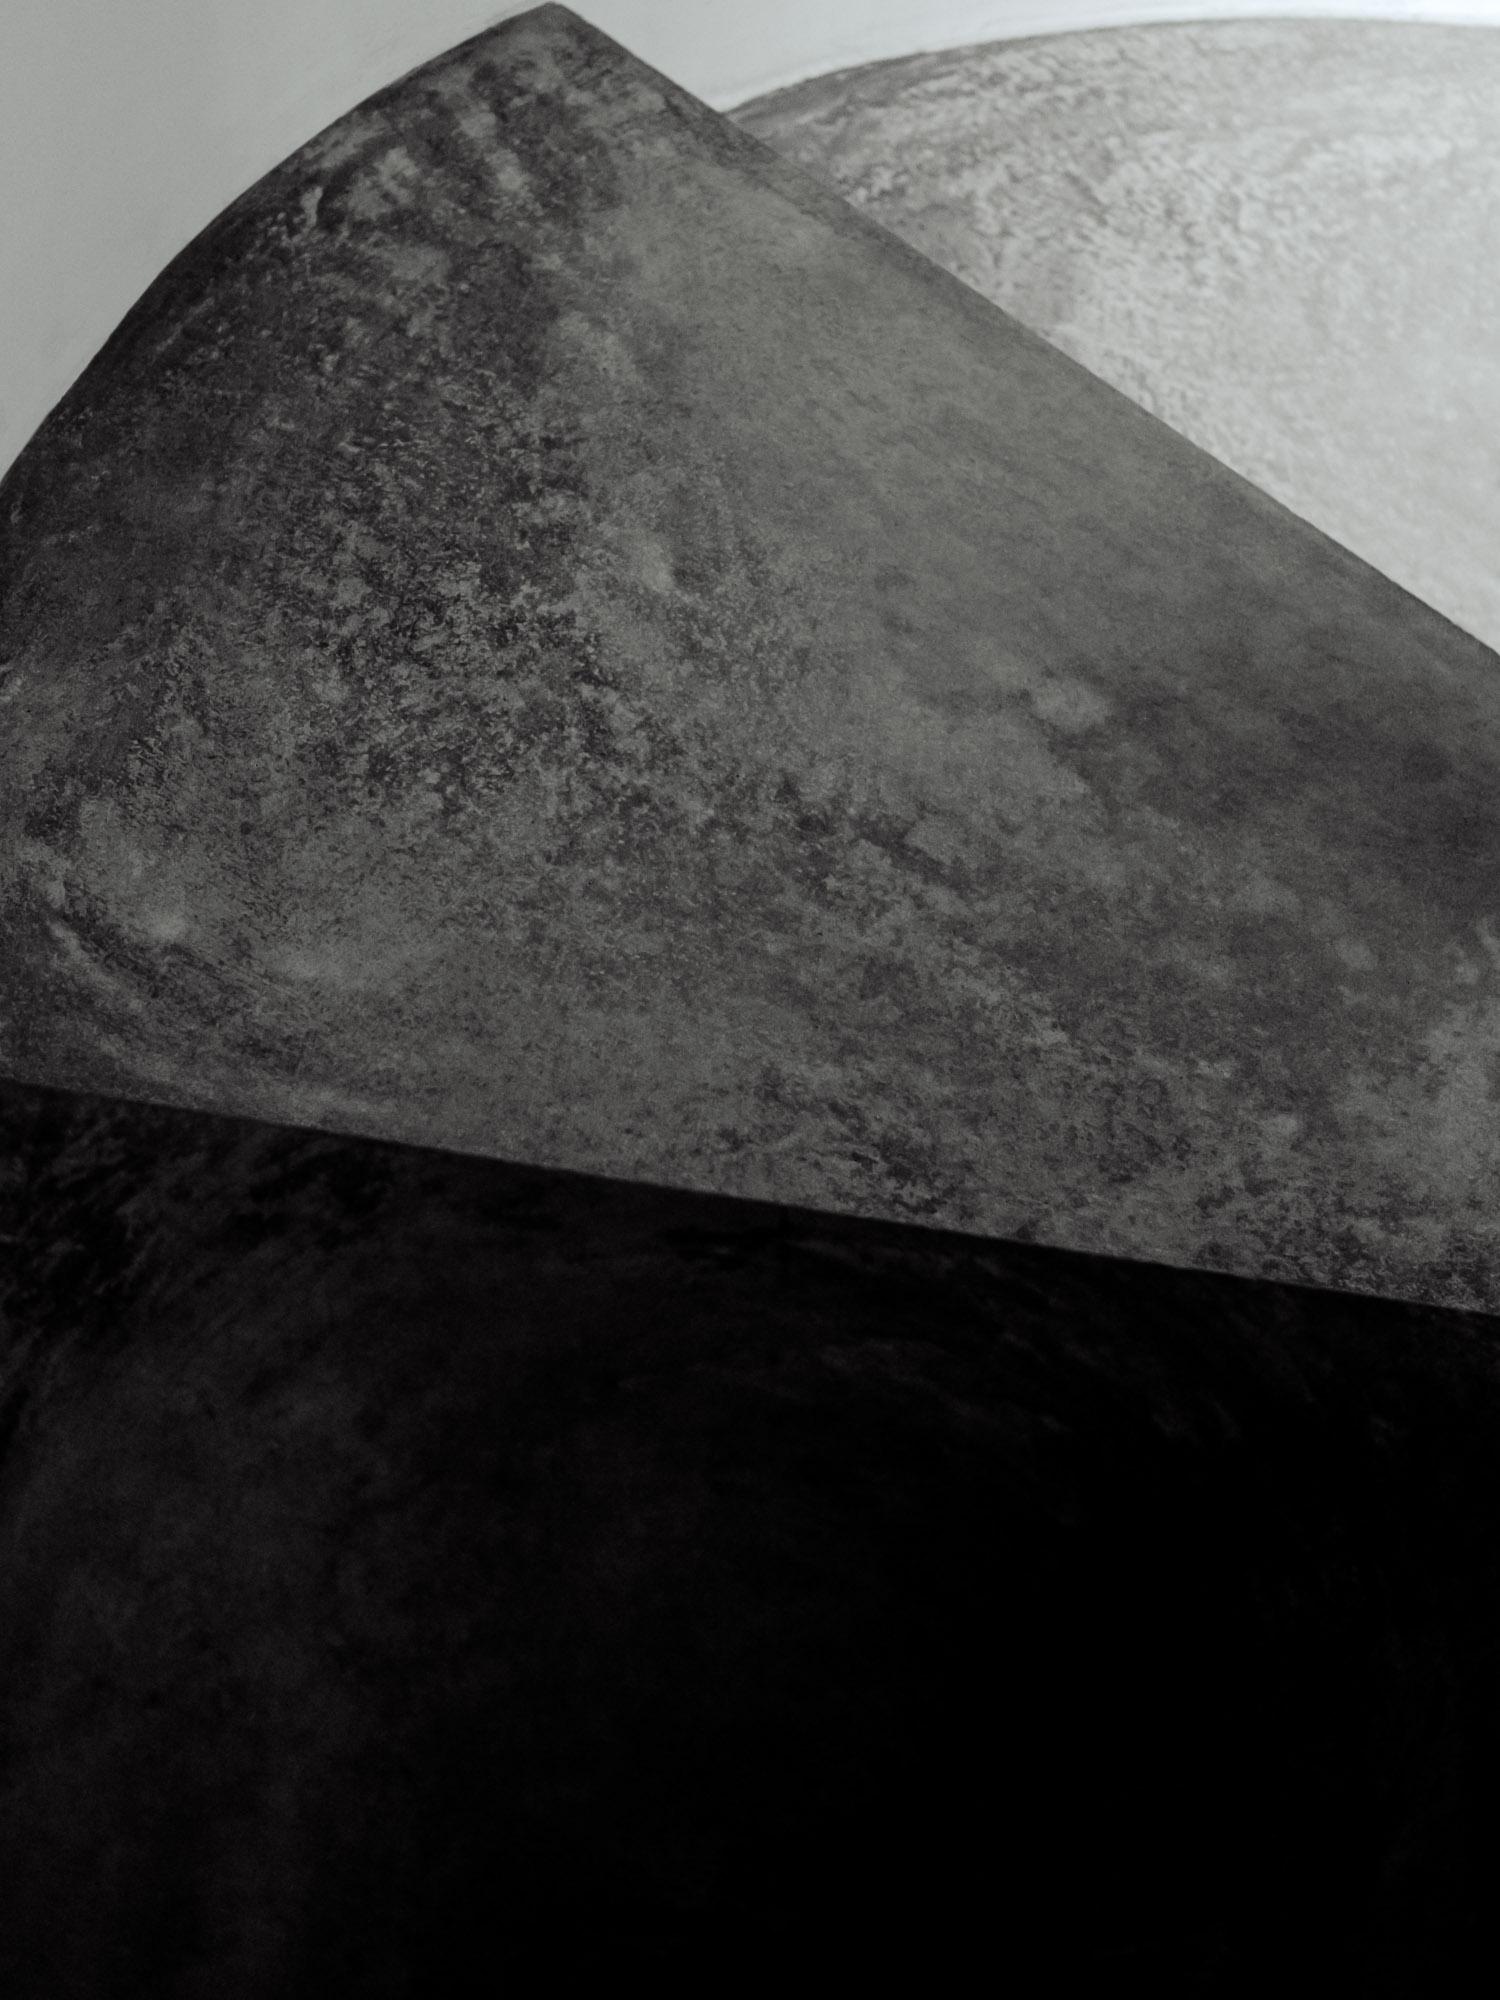 ignant-samsung-jonas-bjerre-poulsen-0593